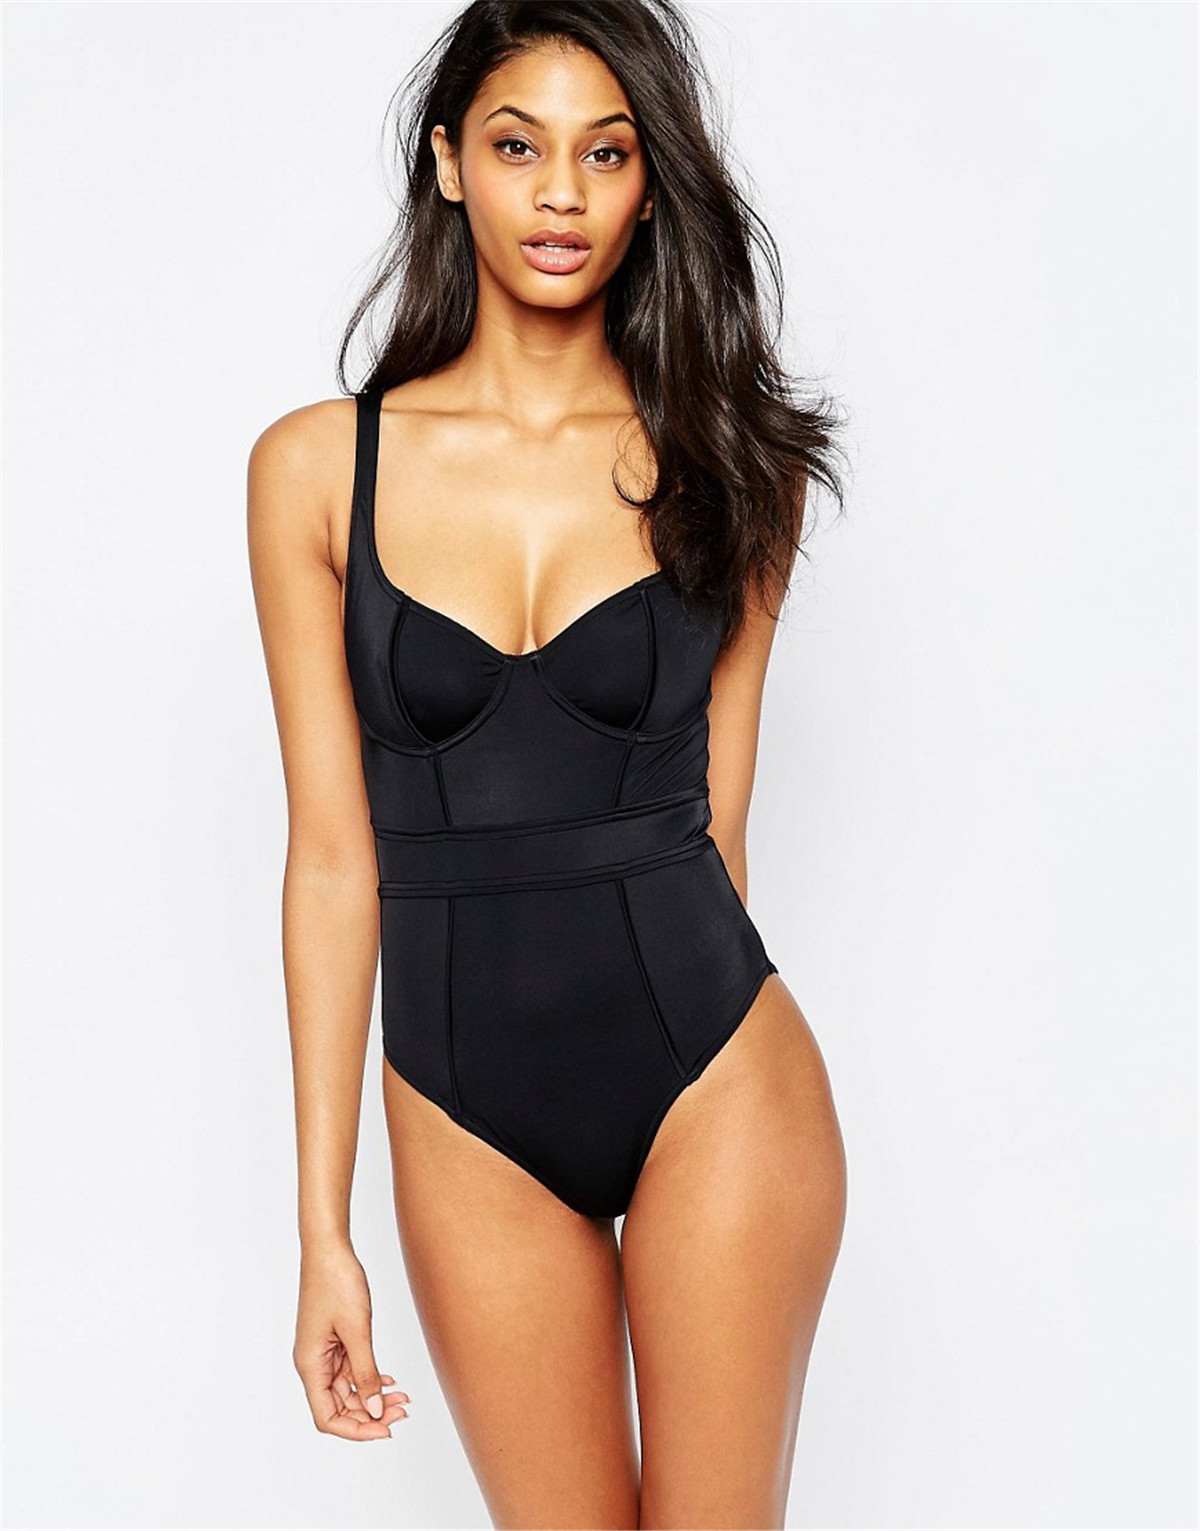 'PromoteOne-Piece Swimsuit Monokini Thong Beachwear Backless Black Sexy Solid Women Female Brazilian